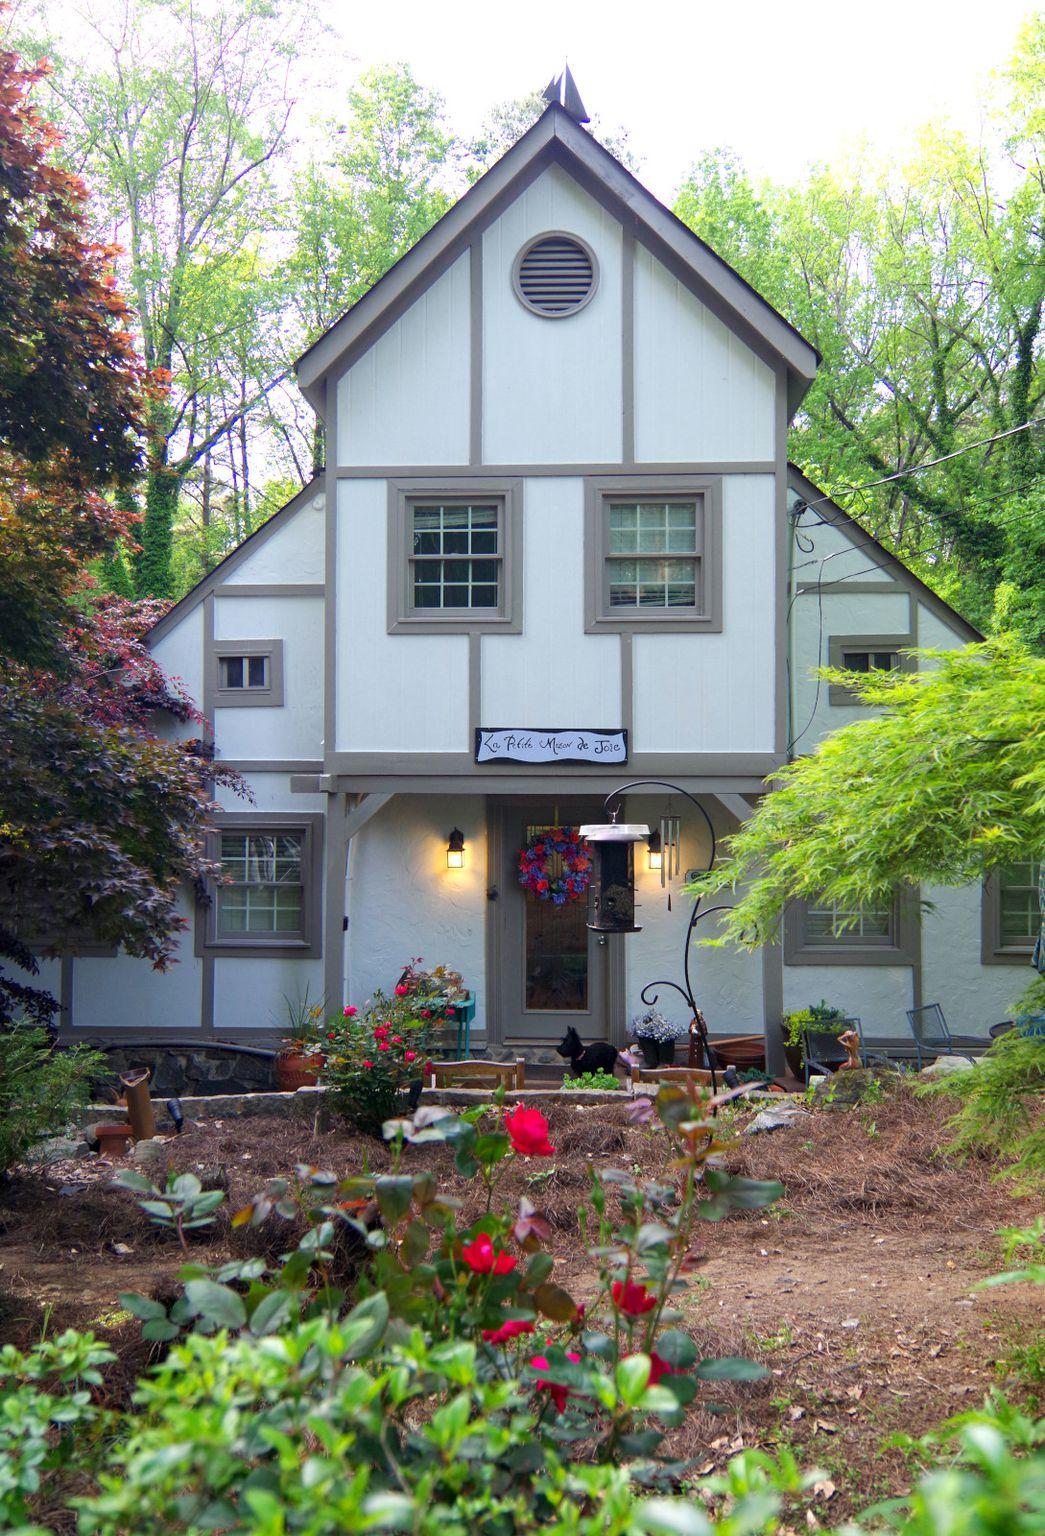 La Petite Maison Atlanta 2081 lyle ave, college park, ga - 1 bed, 1 bath single